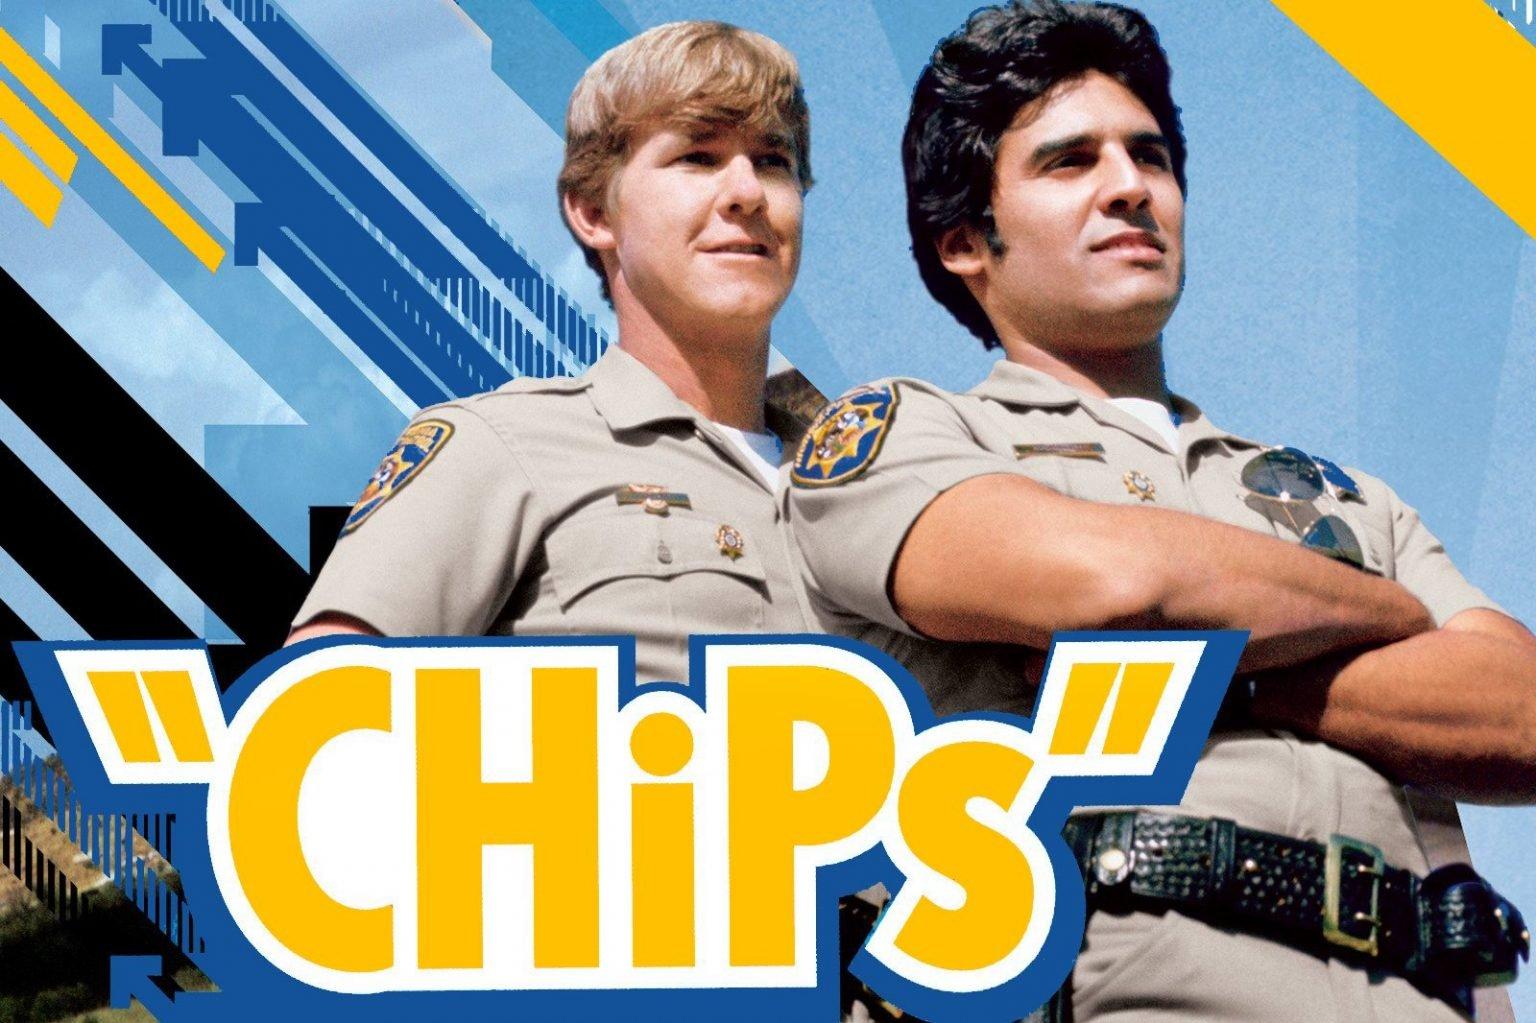 Vintage CHiPS TV series